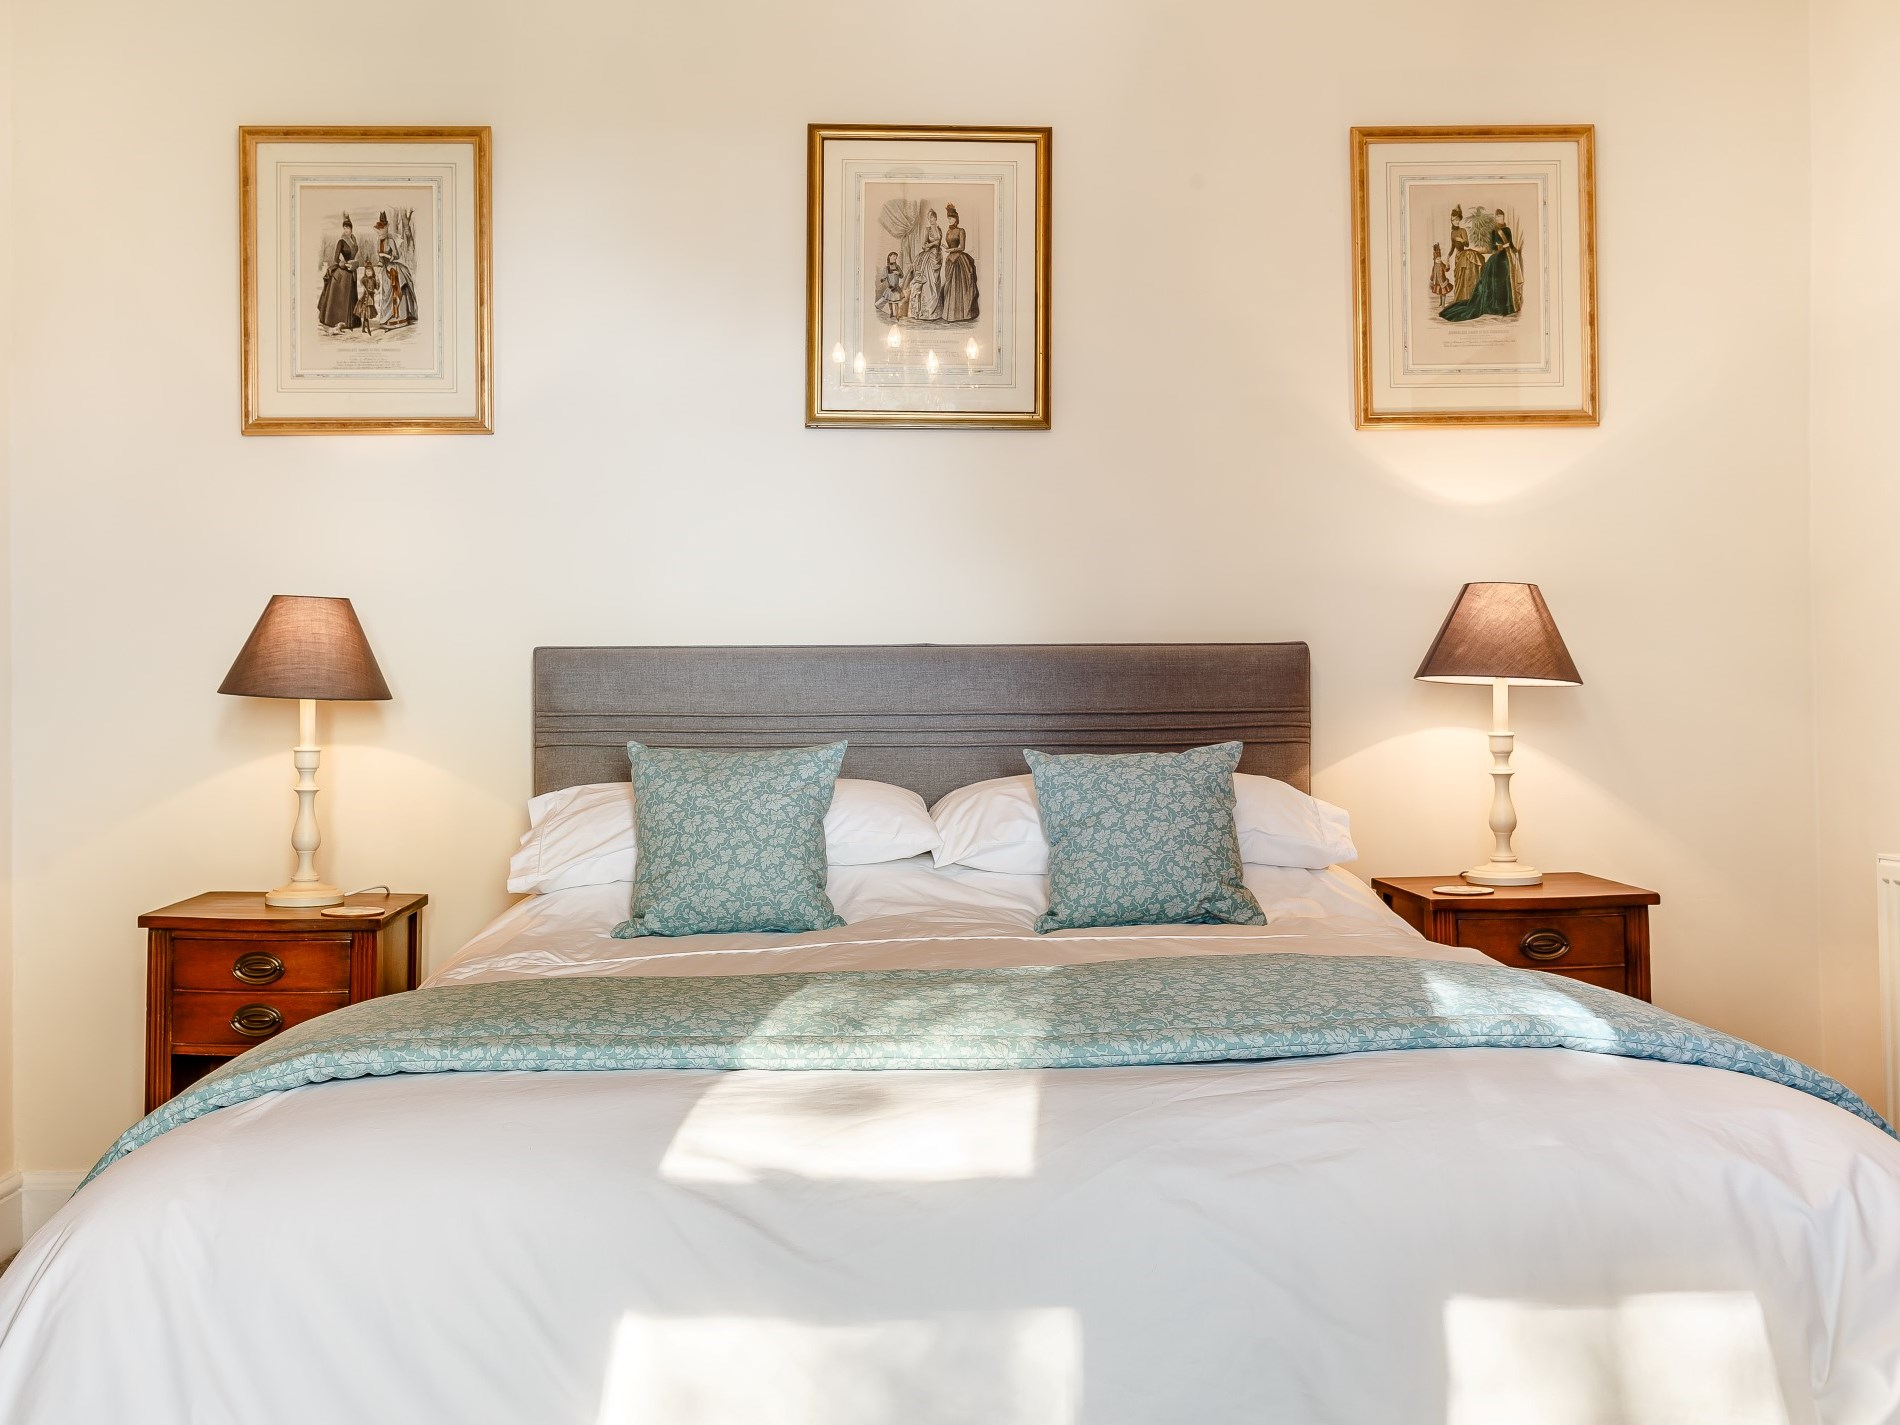 4 Bedroom House in West Cornwall, Cornwall